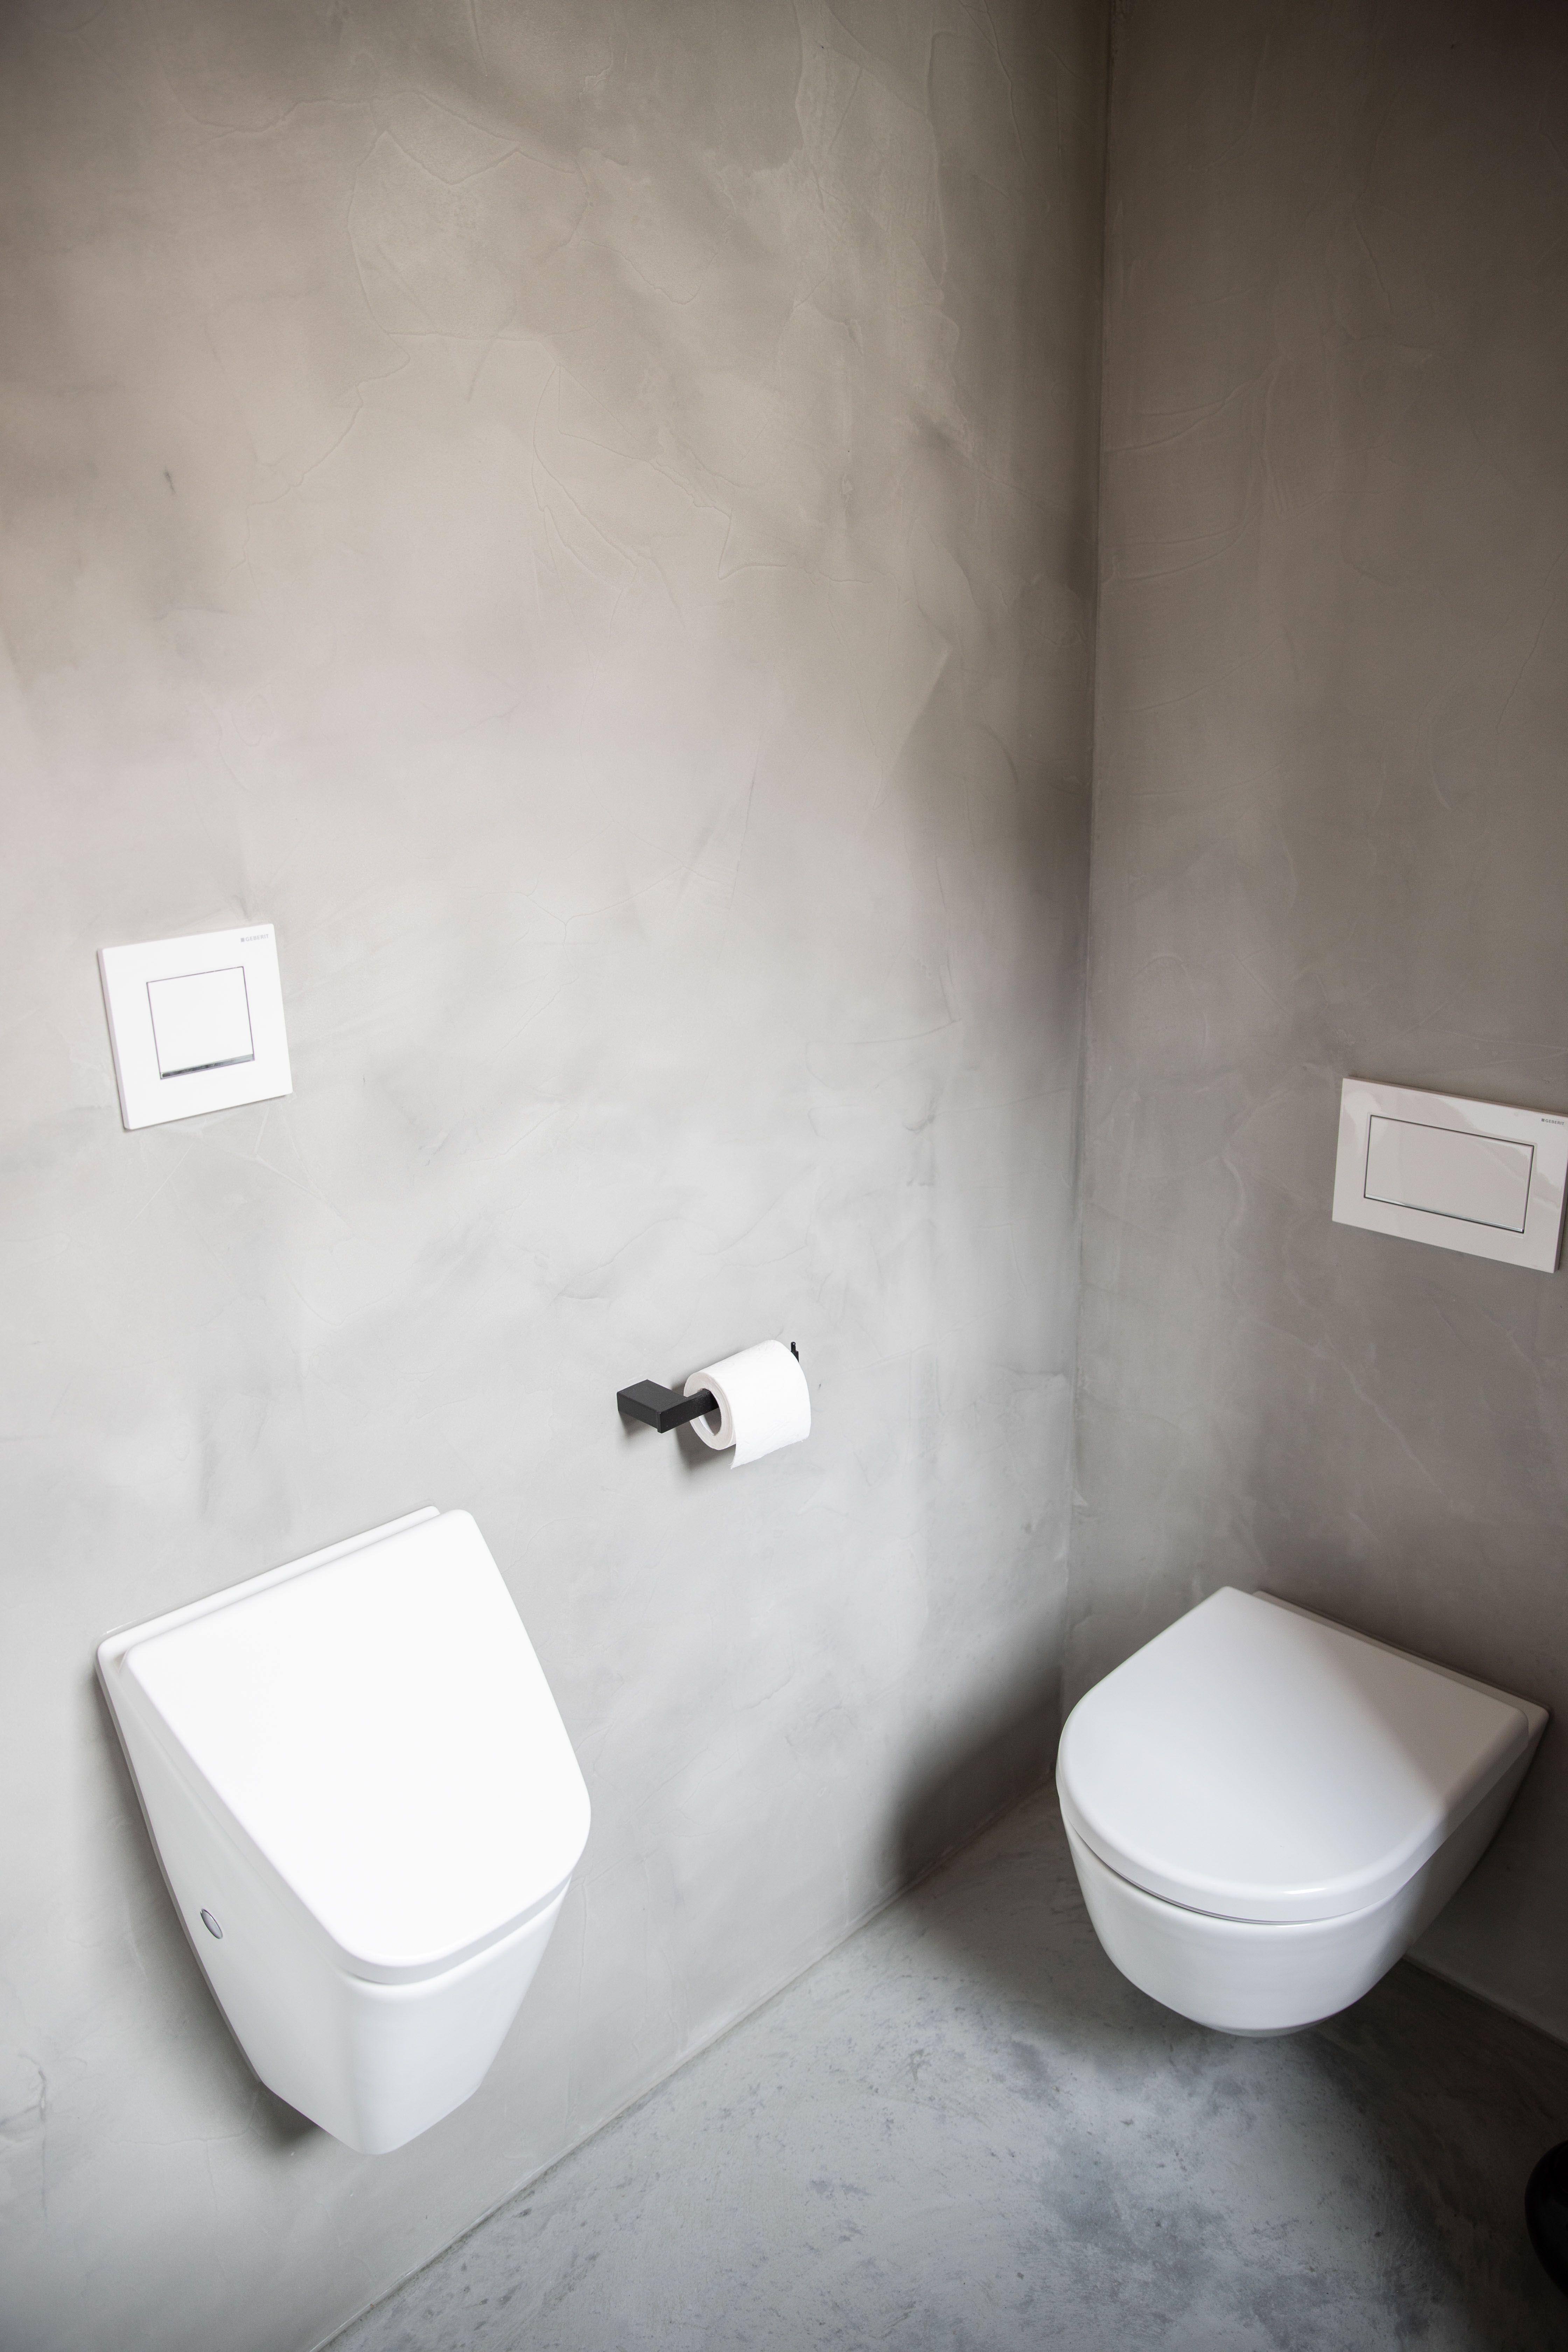 Firma Singhammer Bodensysteme In 2020 Bathroom Toilets Toilet Bathroom Interior Design